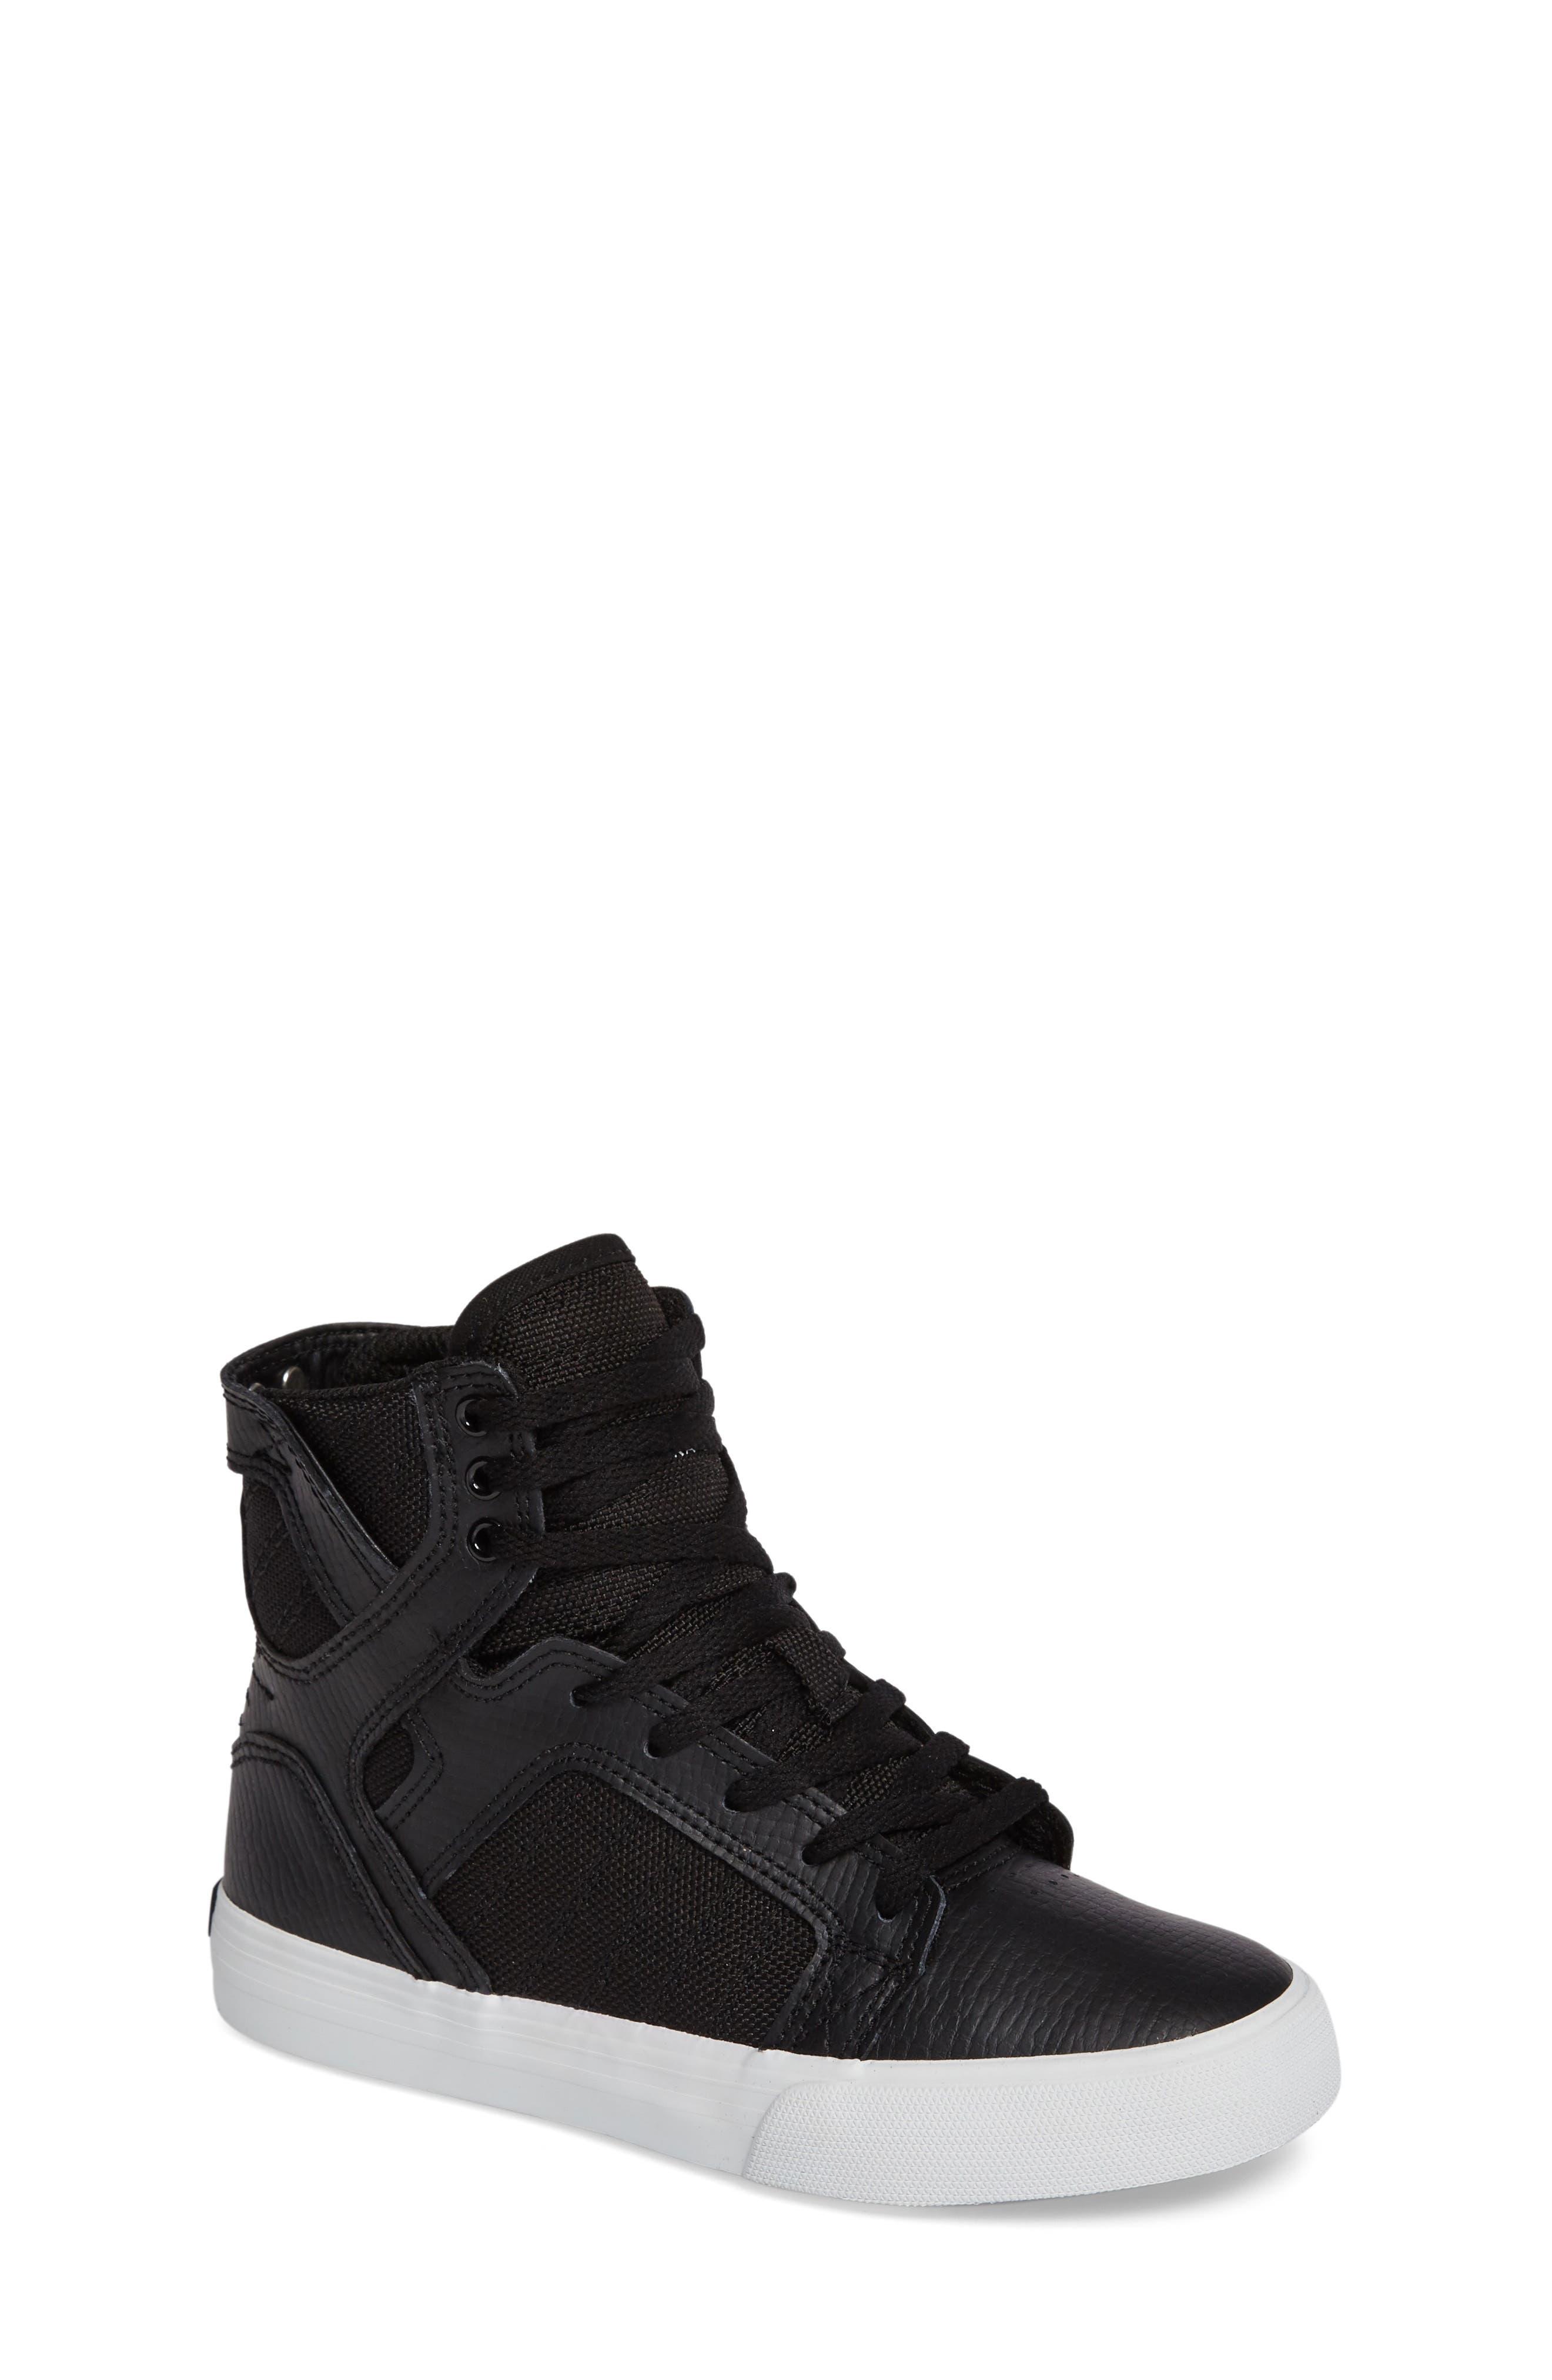 'Skytop' High Top Sneaker,                             Main thumbnail 1, color,                             Black/ White